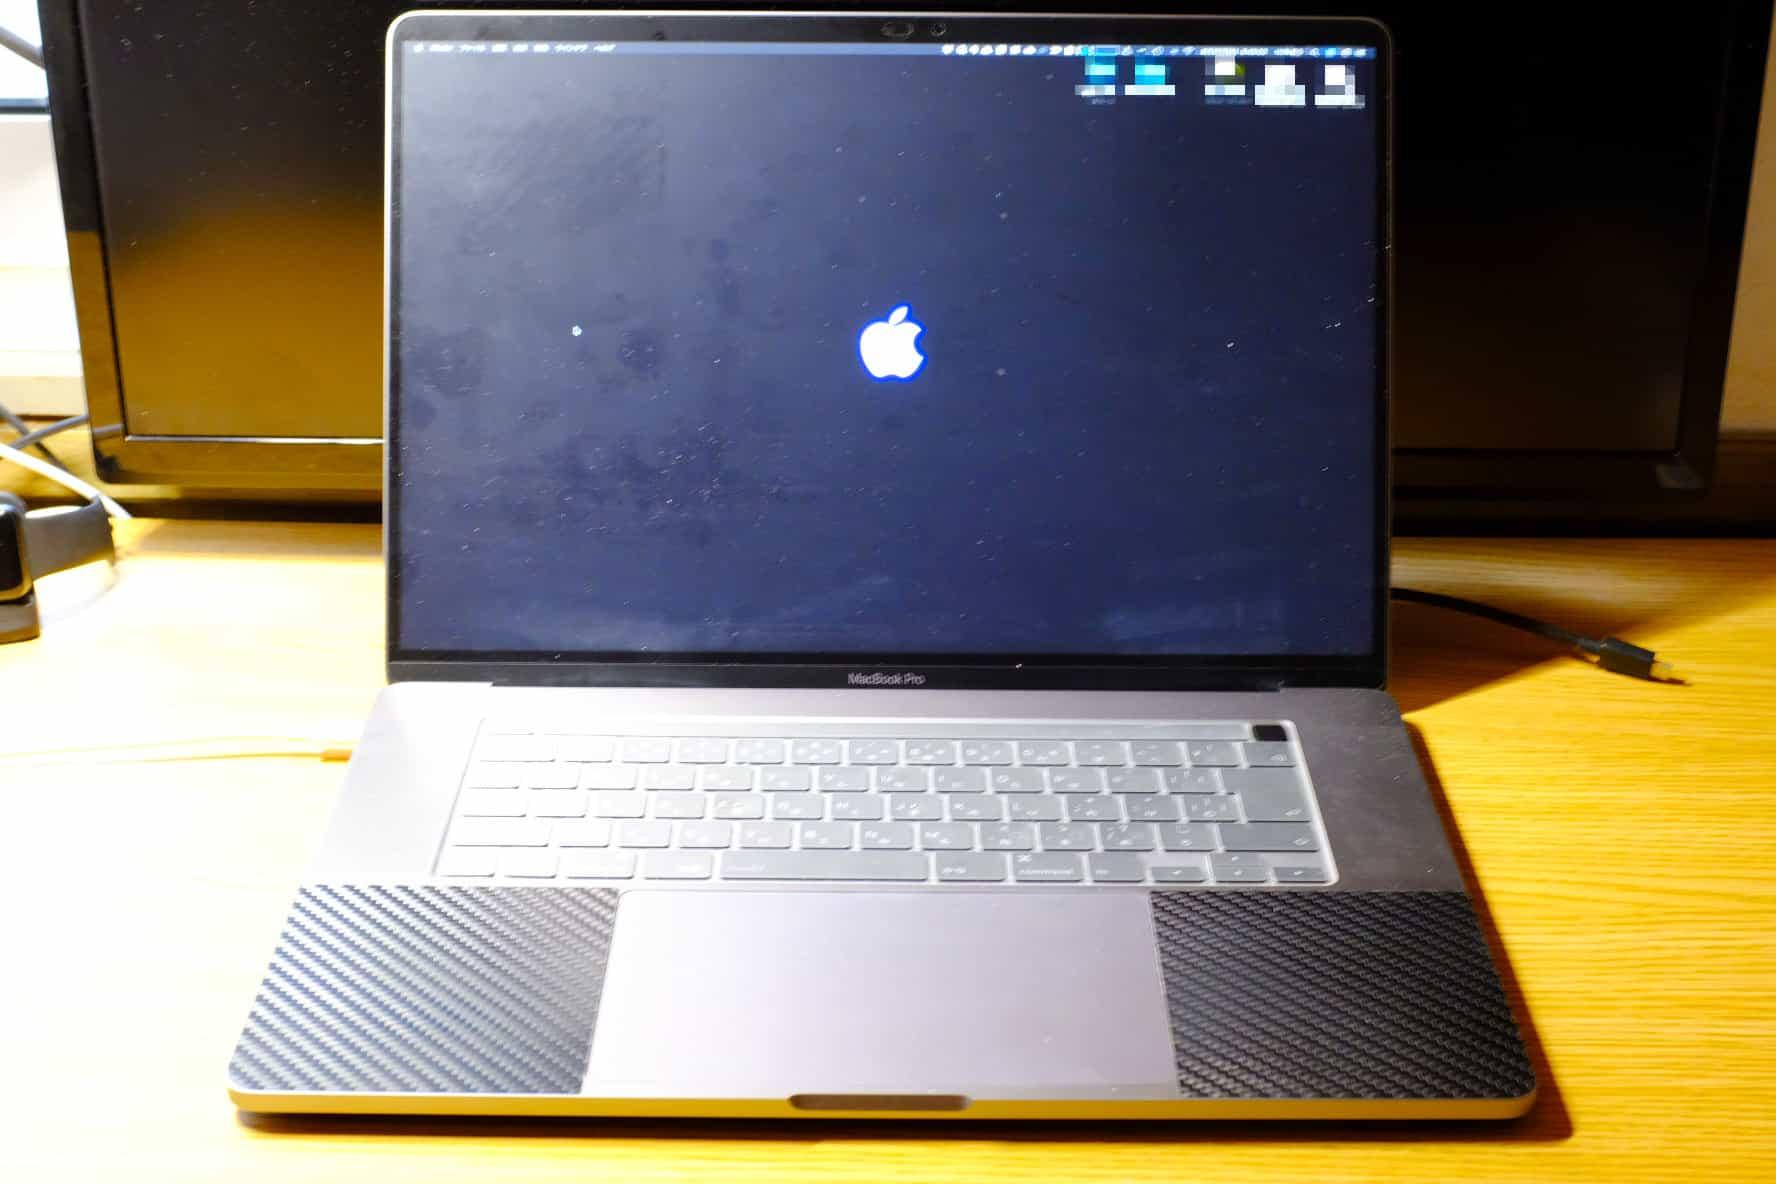 MacBookを10分で掃除!毎日使うモノだからキレイにしたい